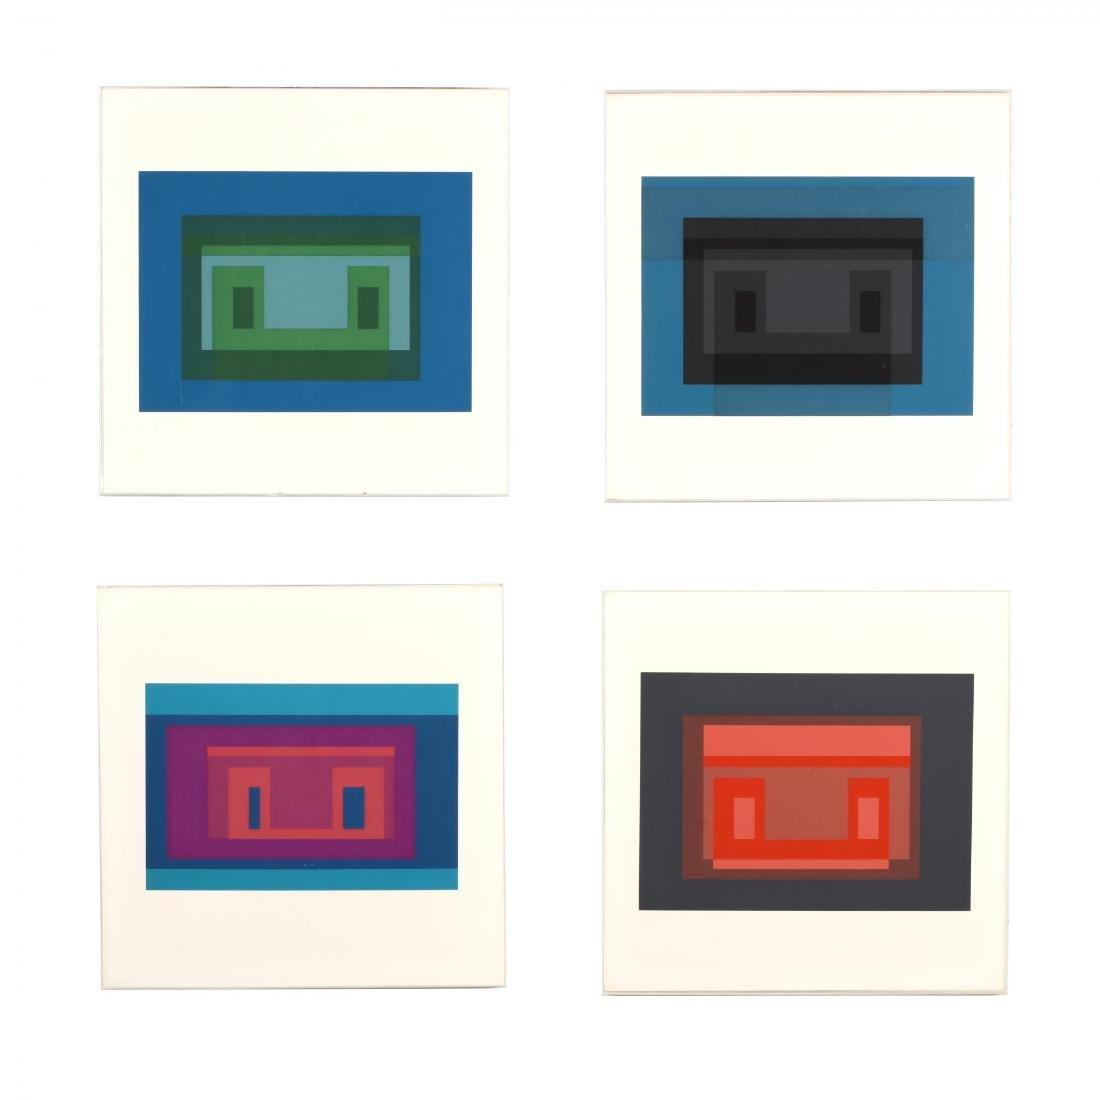 Josef Albers (American/German, 1888-1976), Four